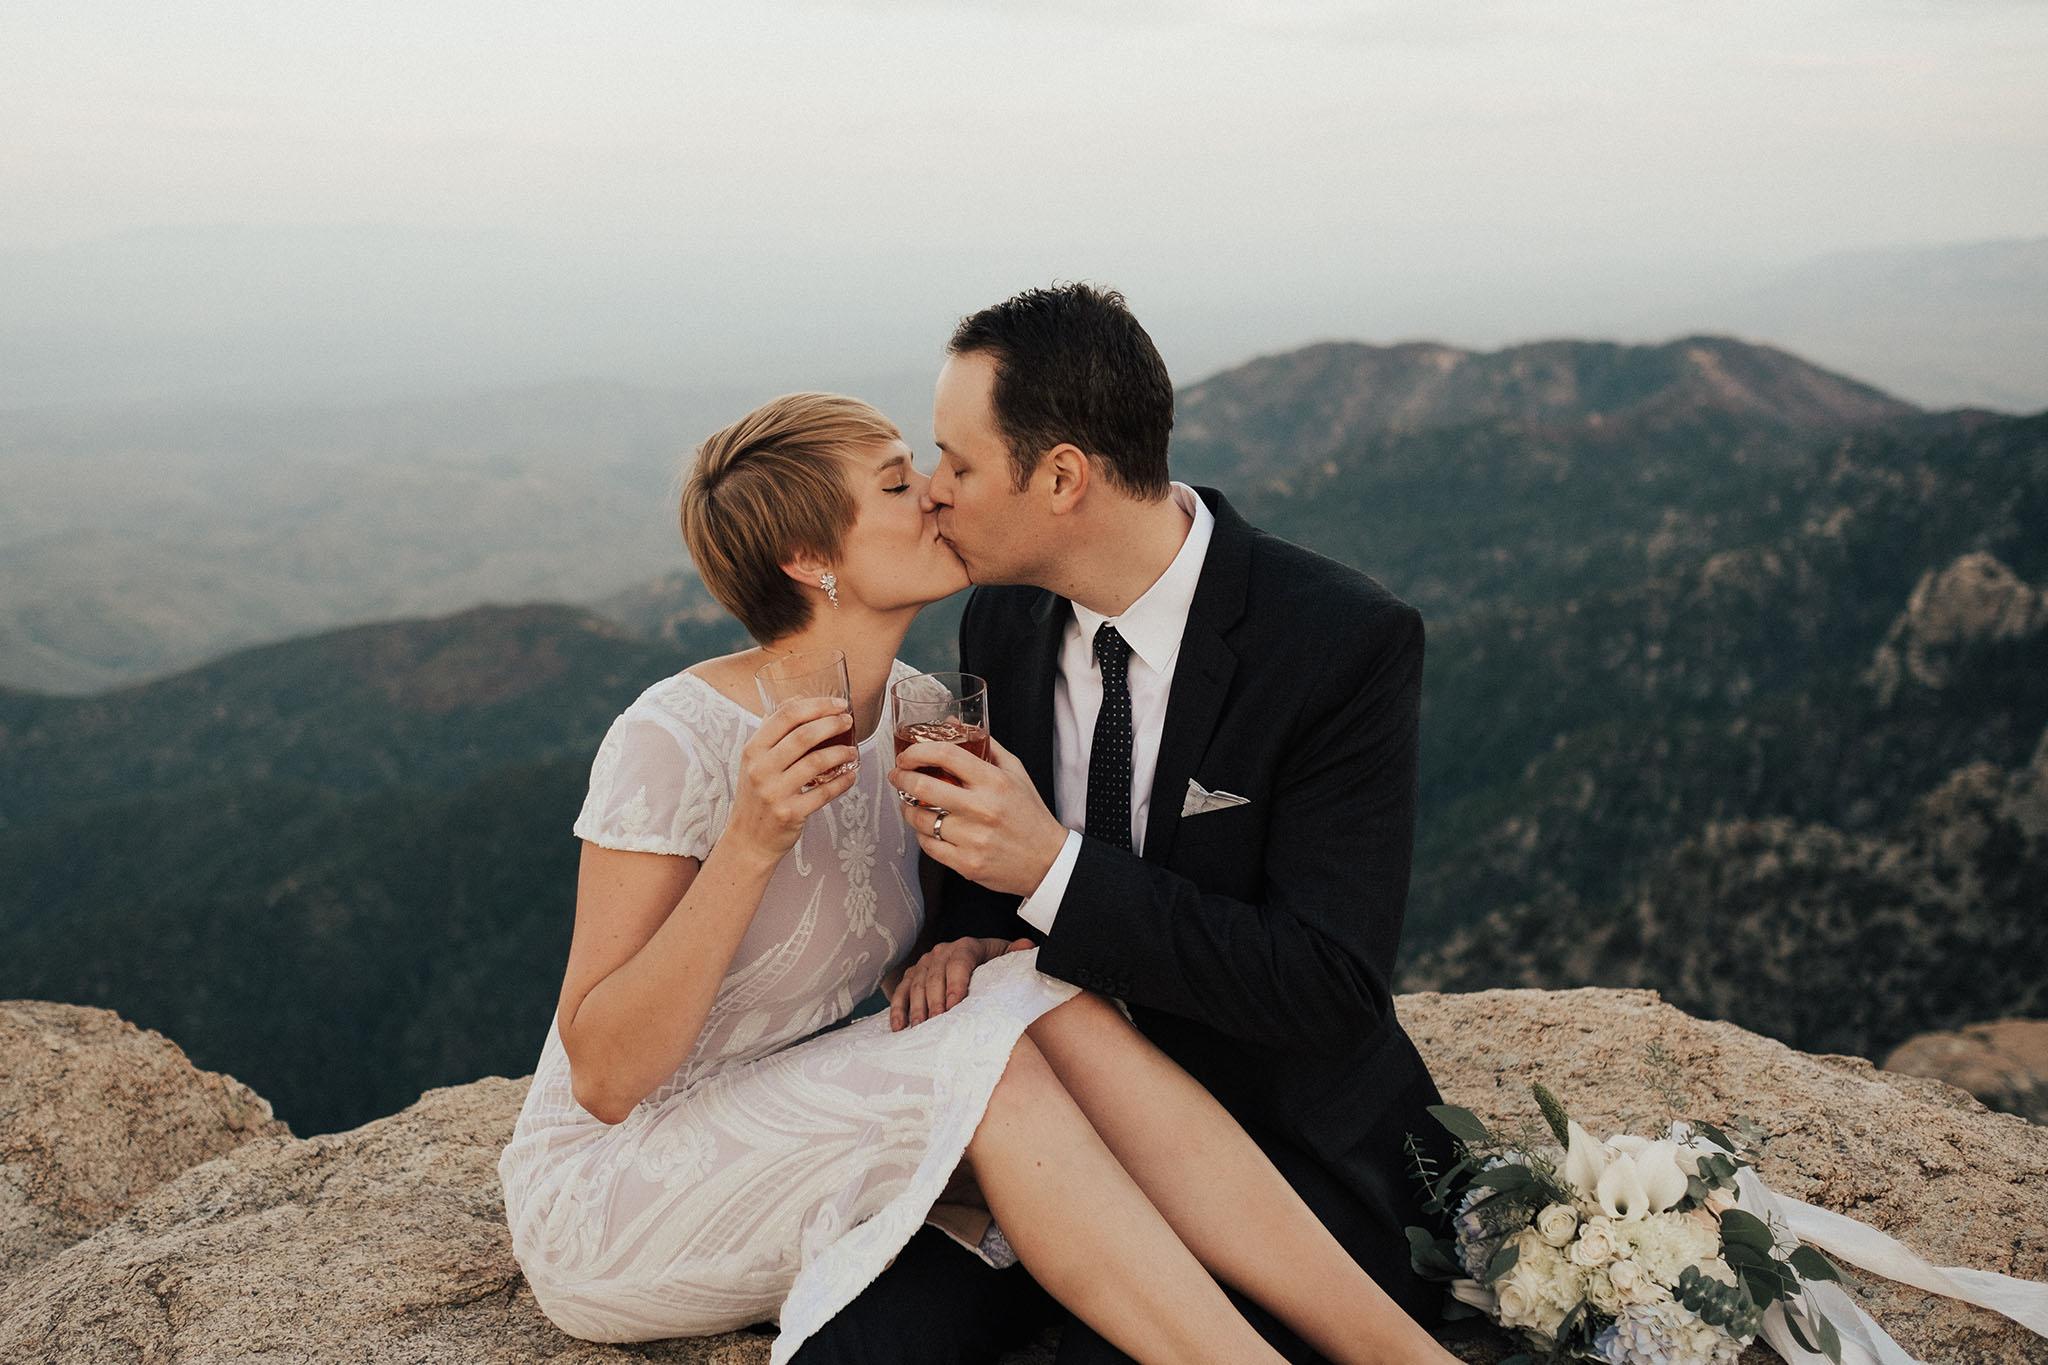 Arizona-Intimate-Elopement-Adventure-Photographer-Mount-Lemmon (28).jpg